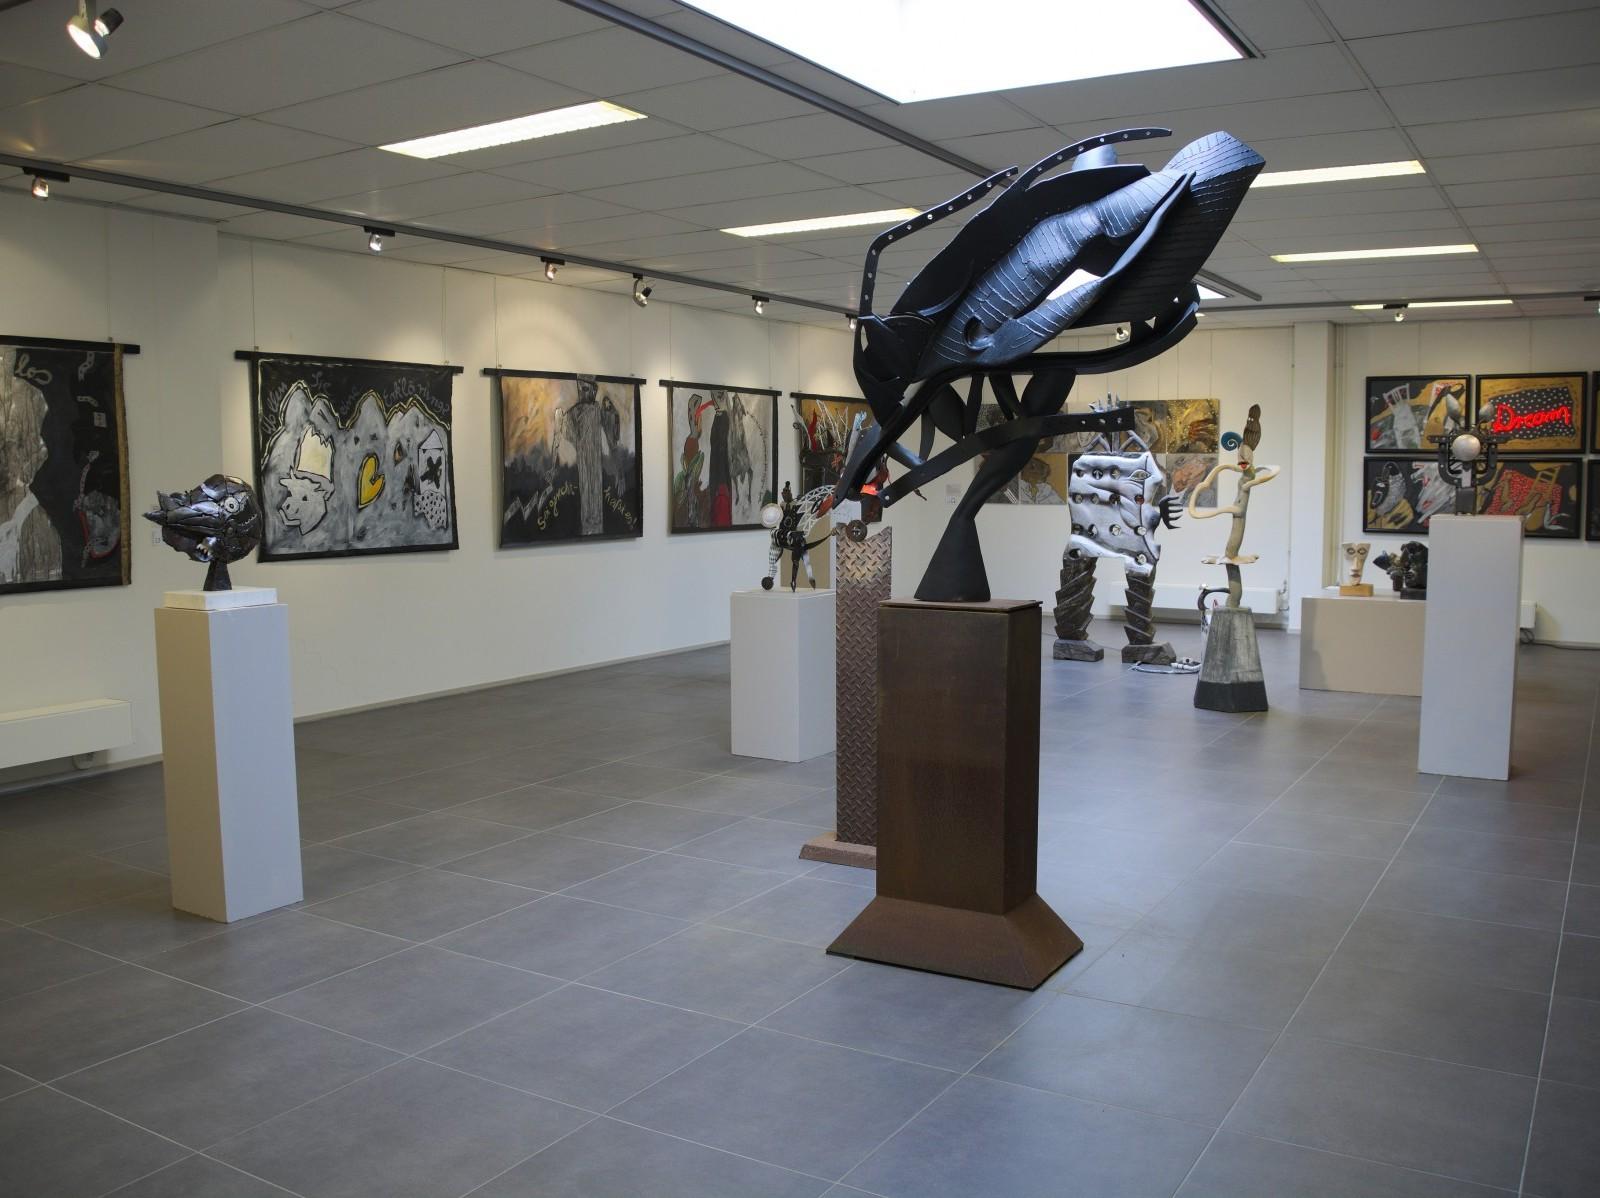 Tentoonstelling 'Maaslandkunstenaars'